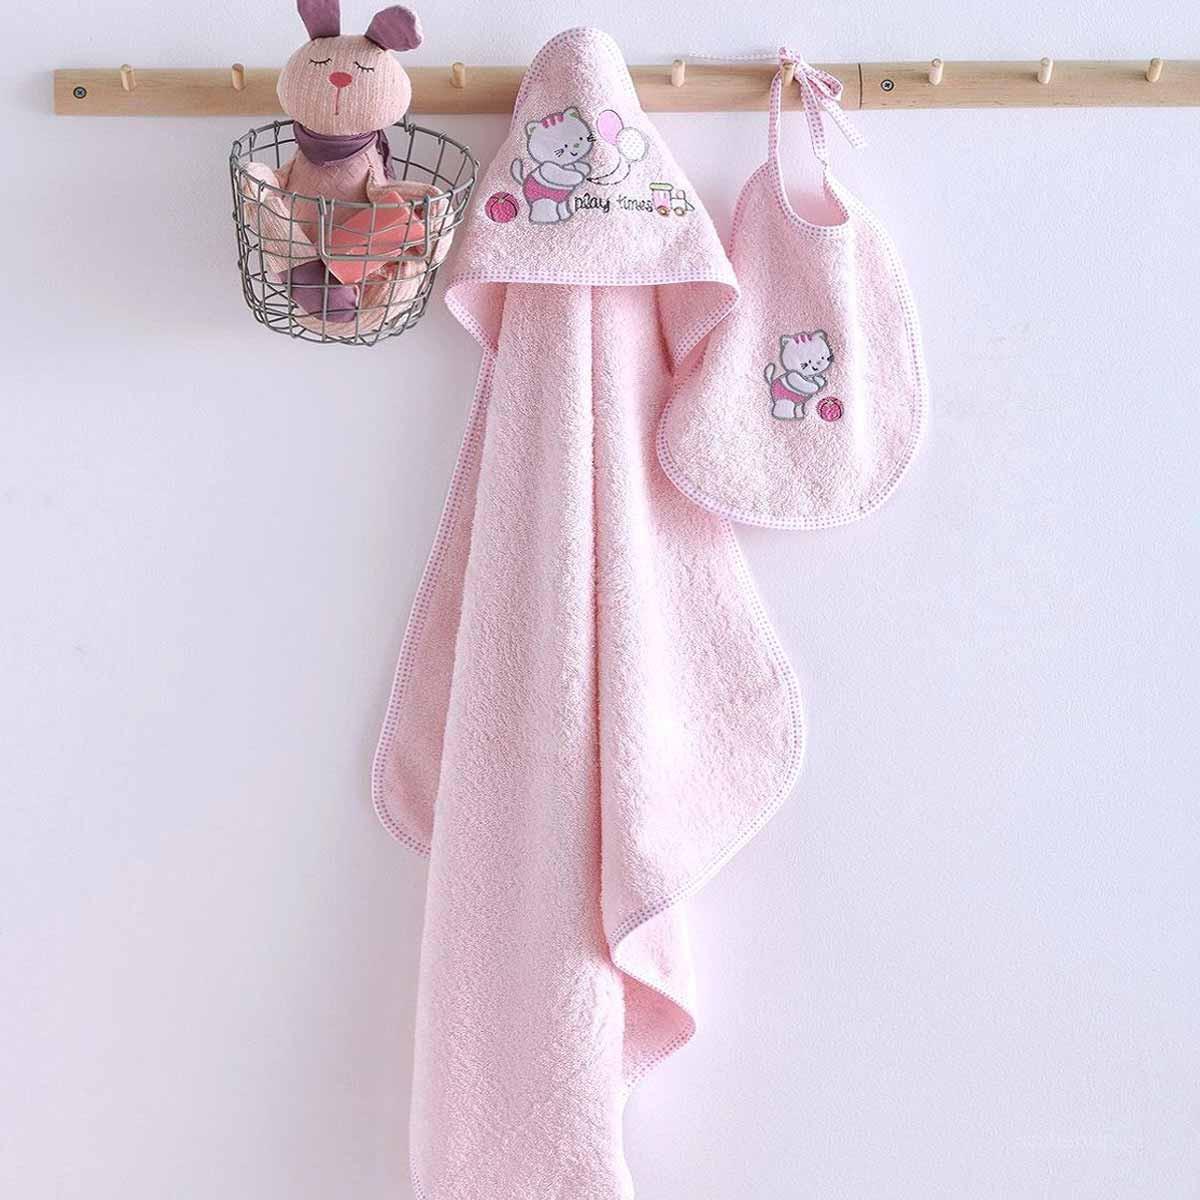 3168ddf9aba SpitiShop Βρεφική Κάπα + Σαλιάρα Sb Home Kitten Pink